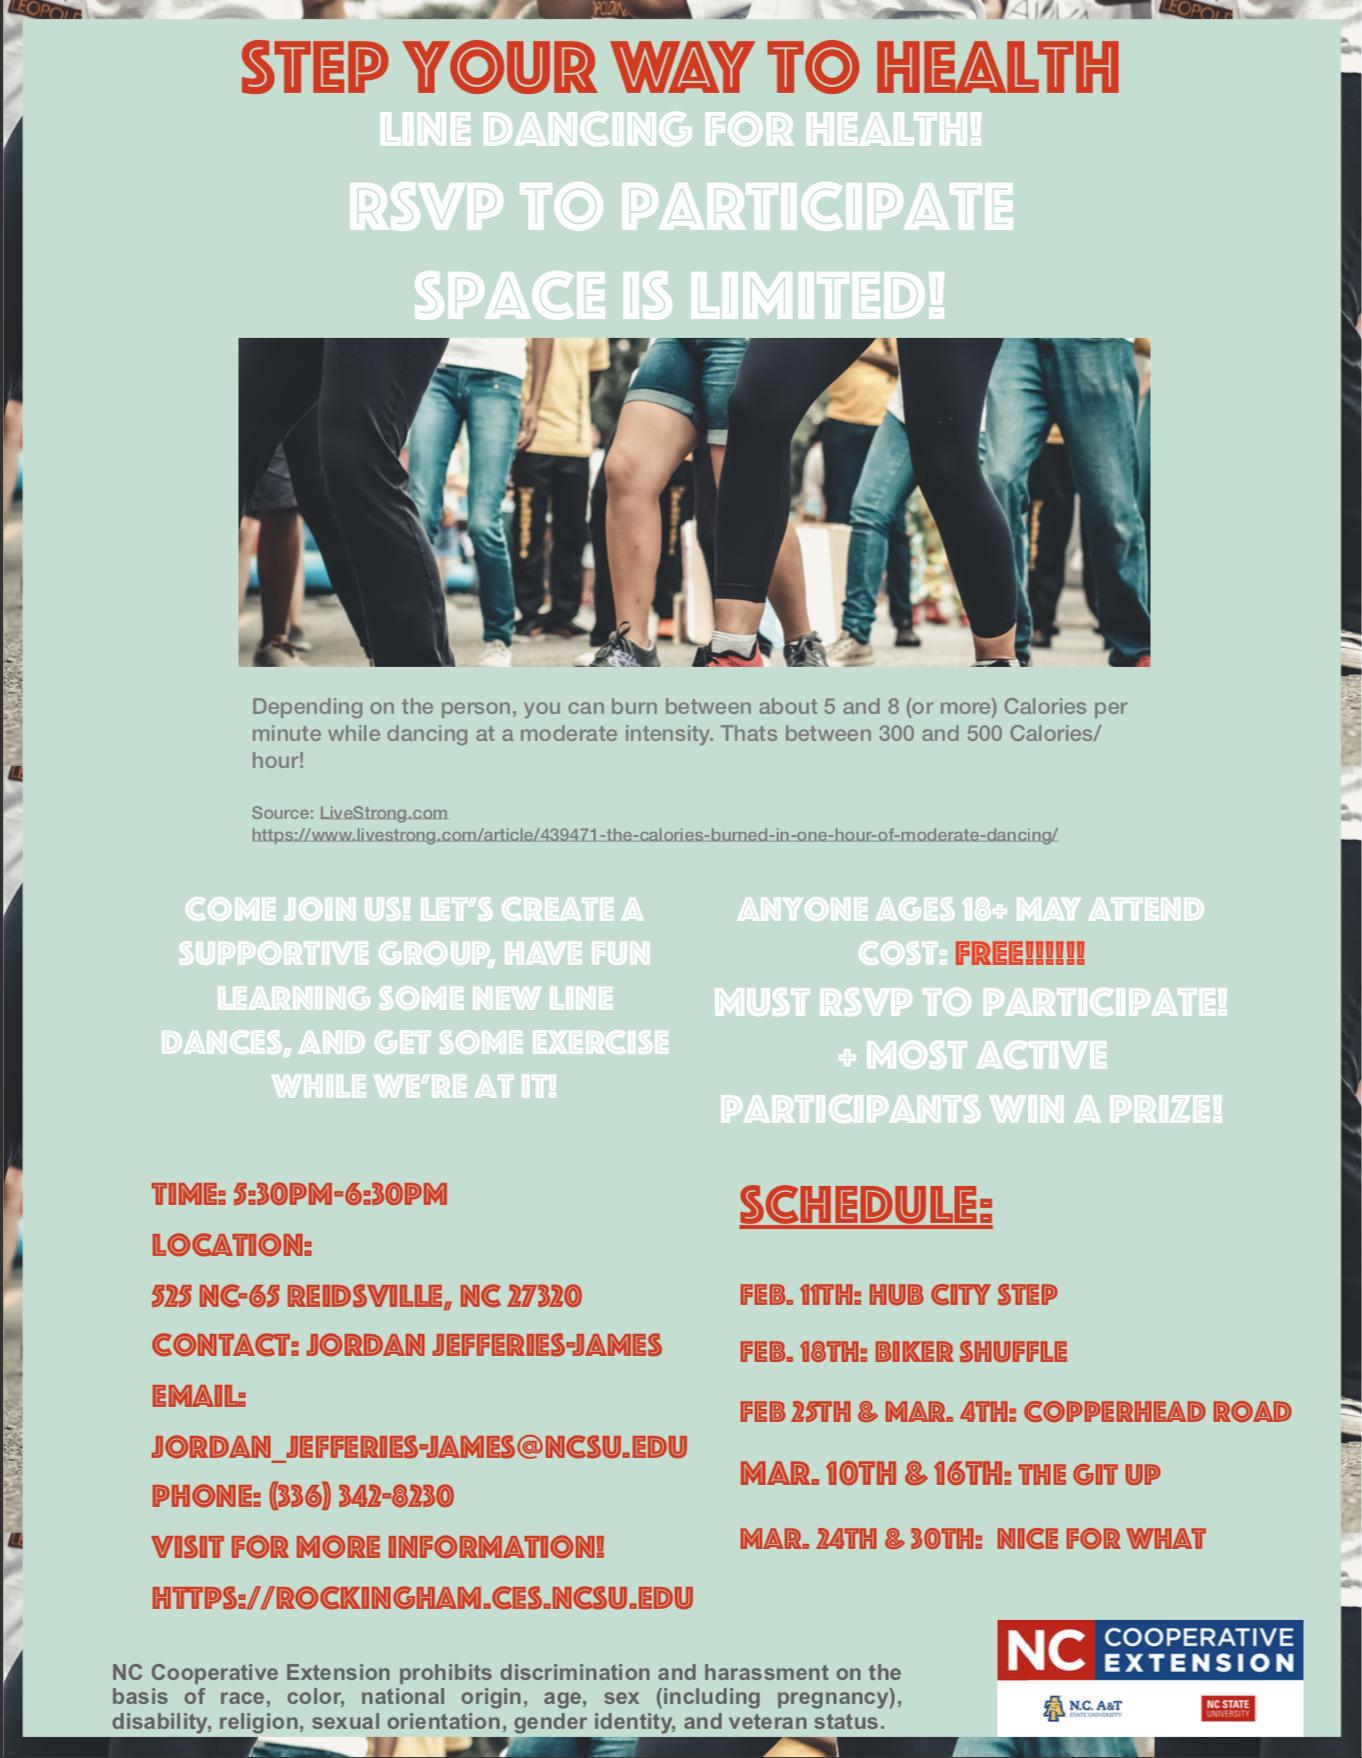 Steps To Health Program Flyer